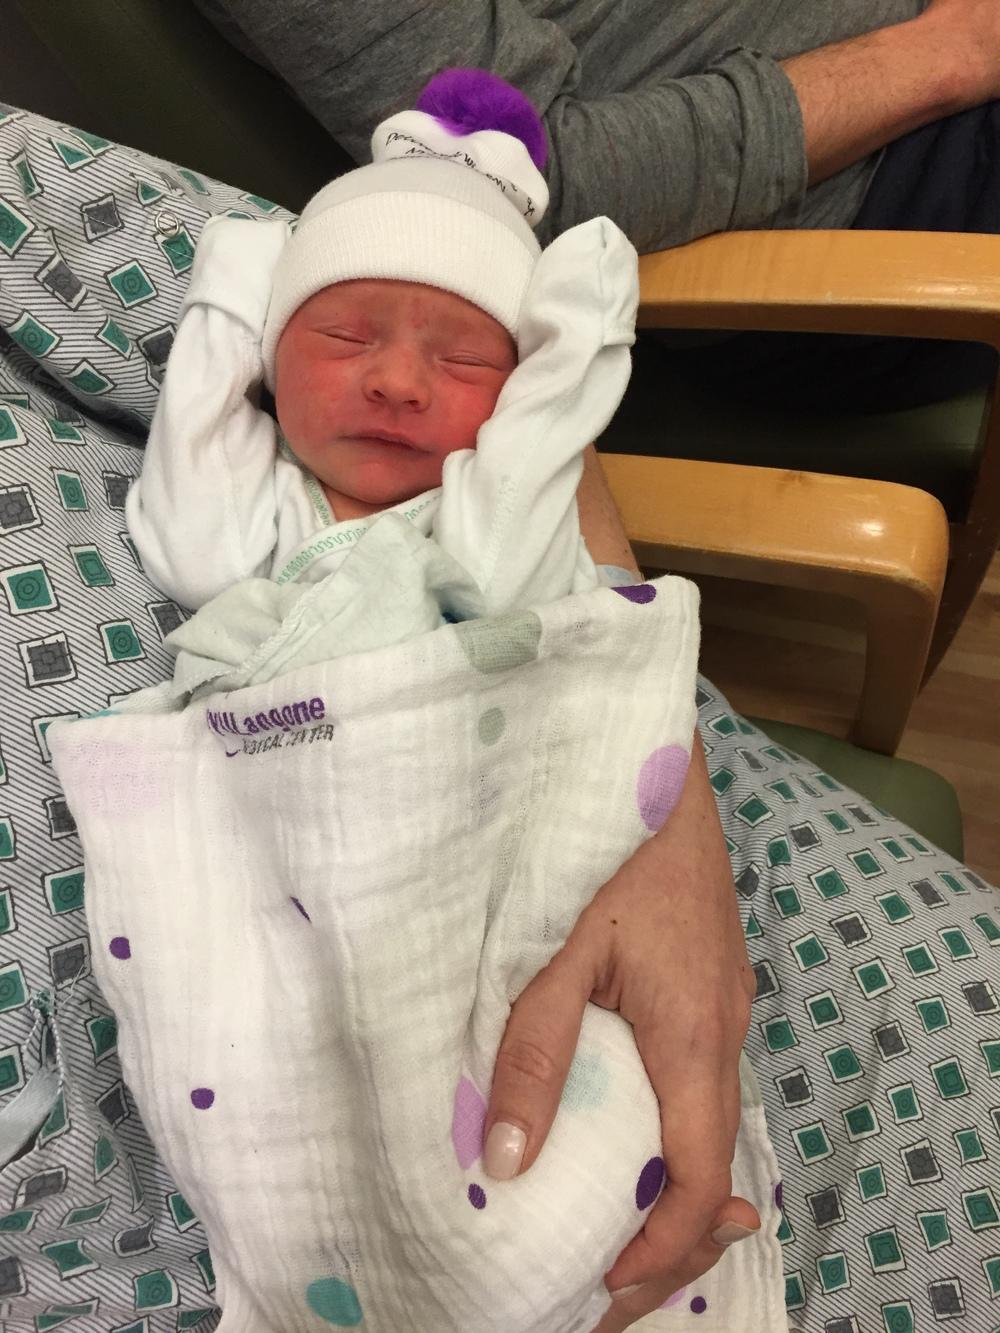 Dylan Thomas Cummings, 17 hours old